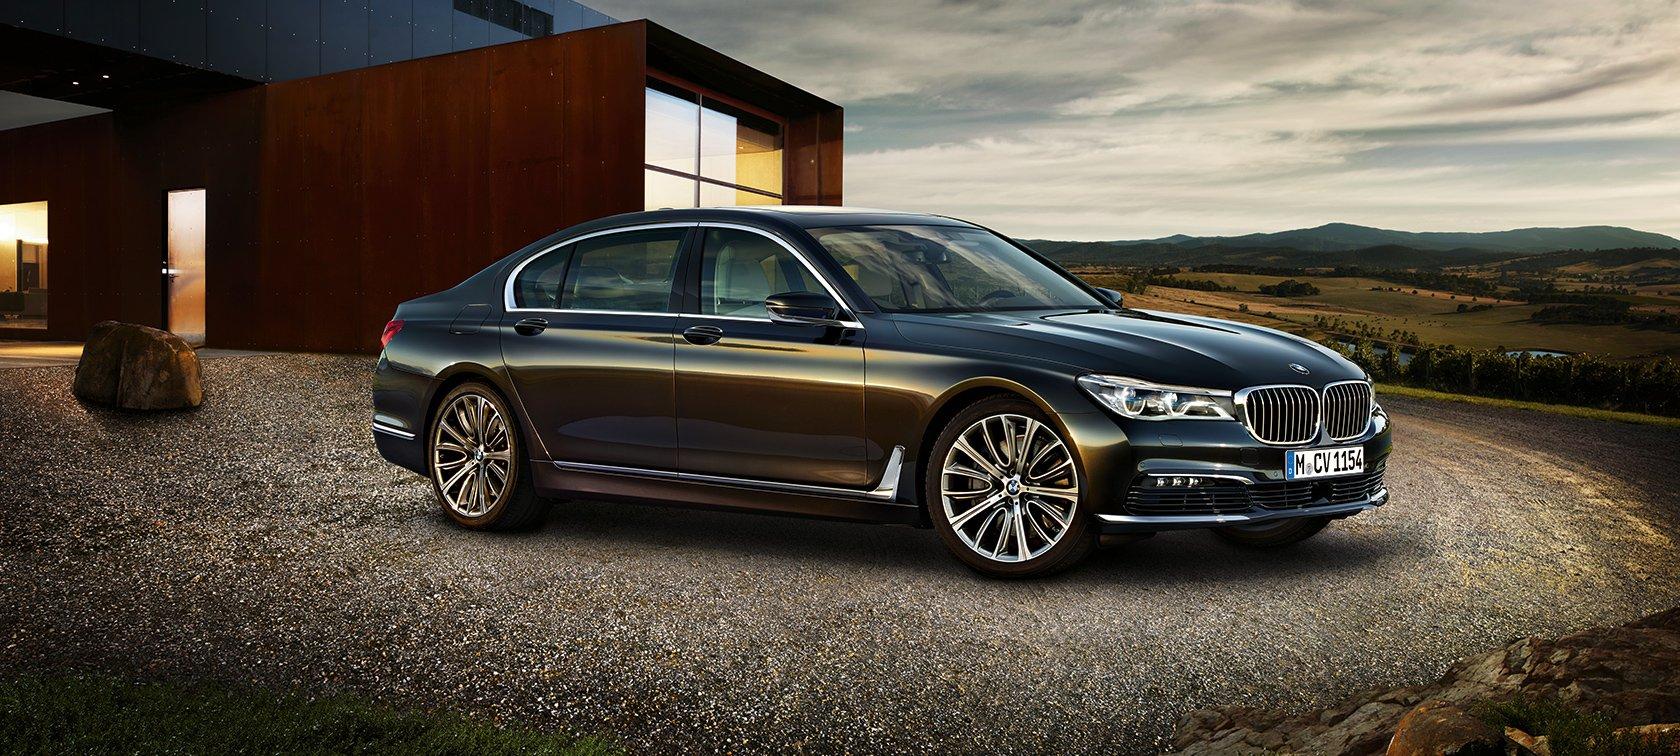 BMW 7er Limousine Highlights